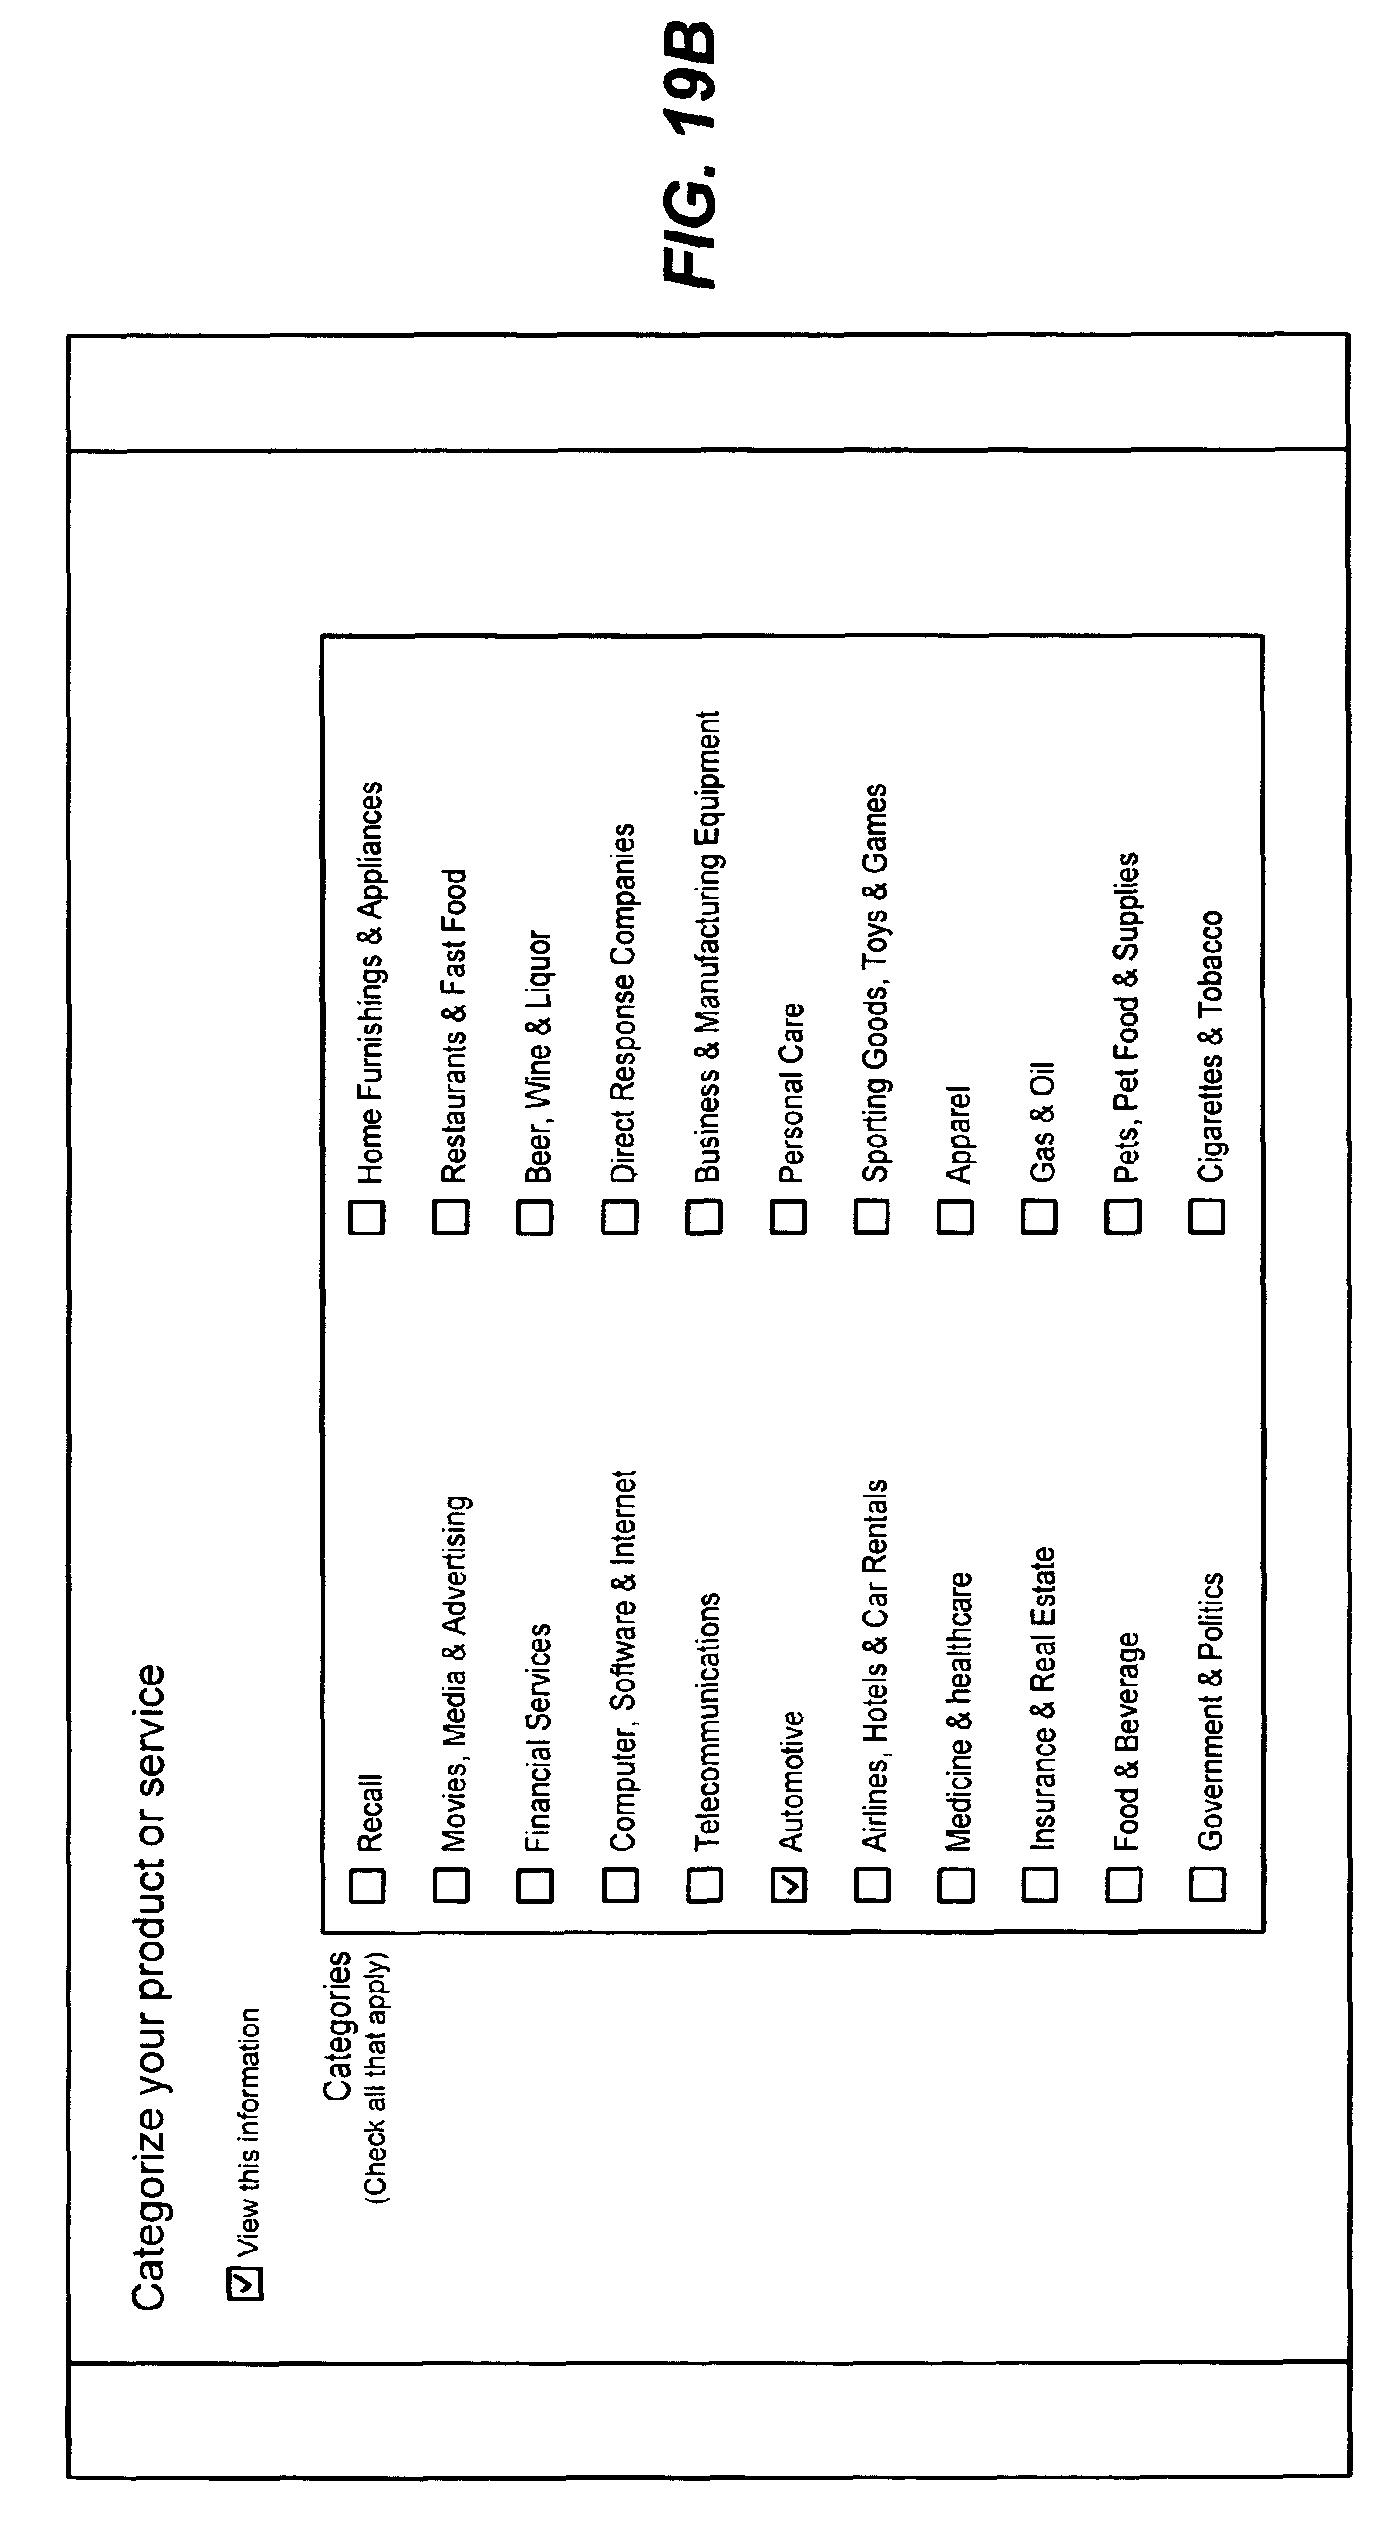 Patent US 9,864,998 B2